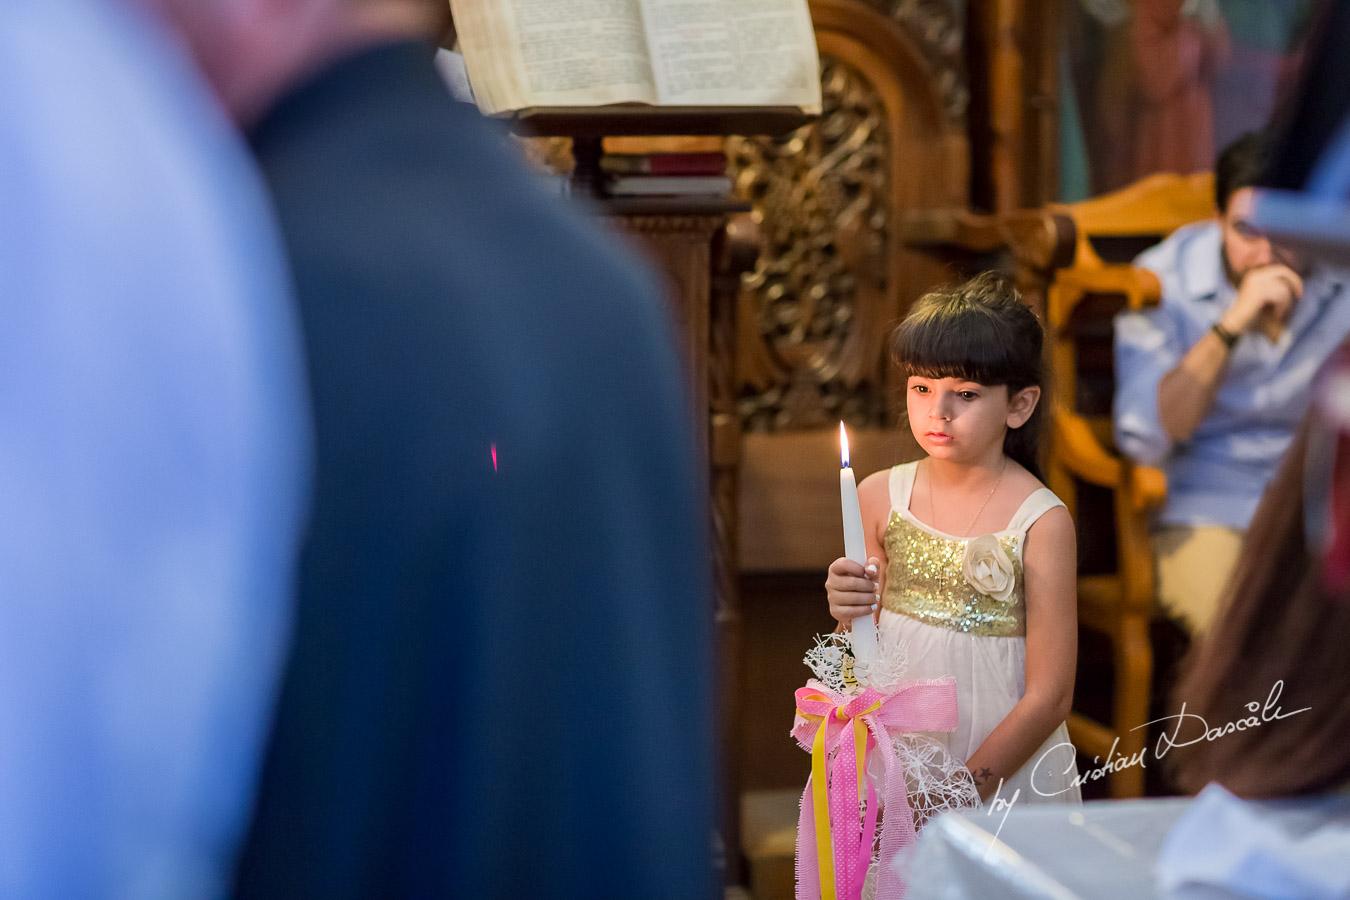 Baptism Photograher in Nicosia - Chrisanti's Christening by Cristian Dascalu - 25